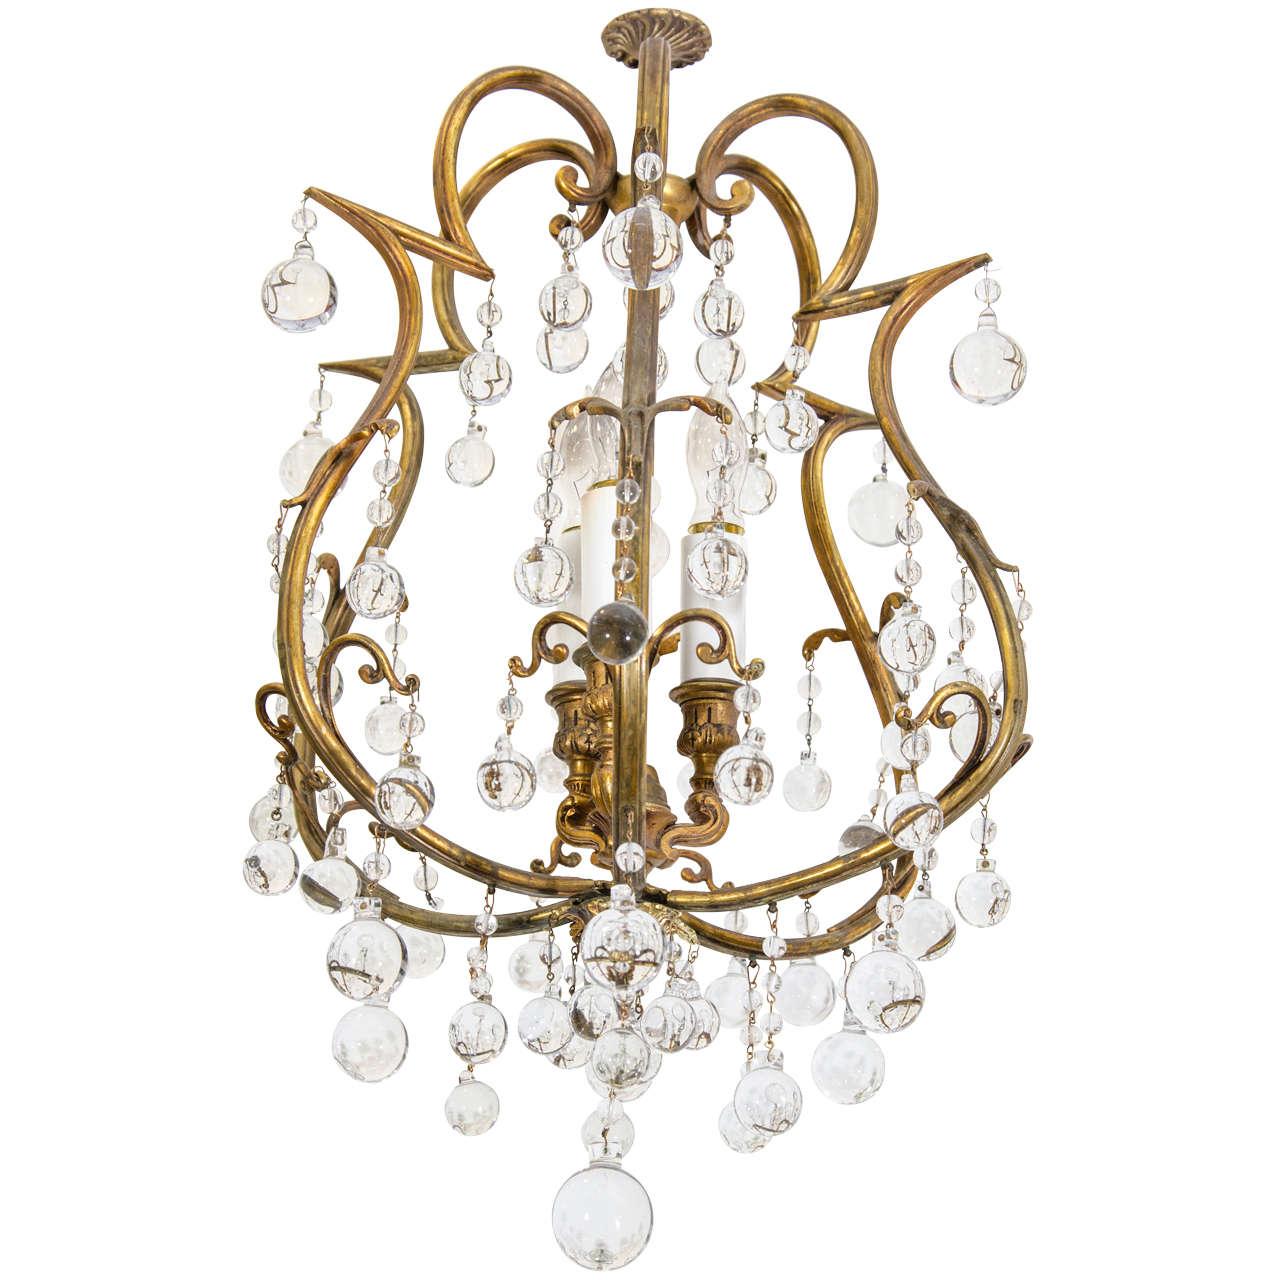 Hollywood regency gilt petite chandelier w crystal beads at 1stdibs hollywood regency gilt petite chandelier w crystal beads for sale aloadofball Images